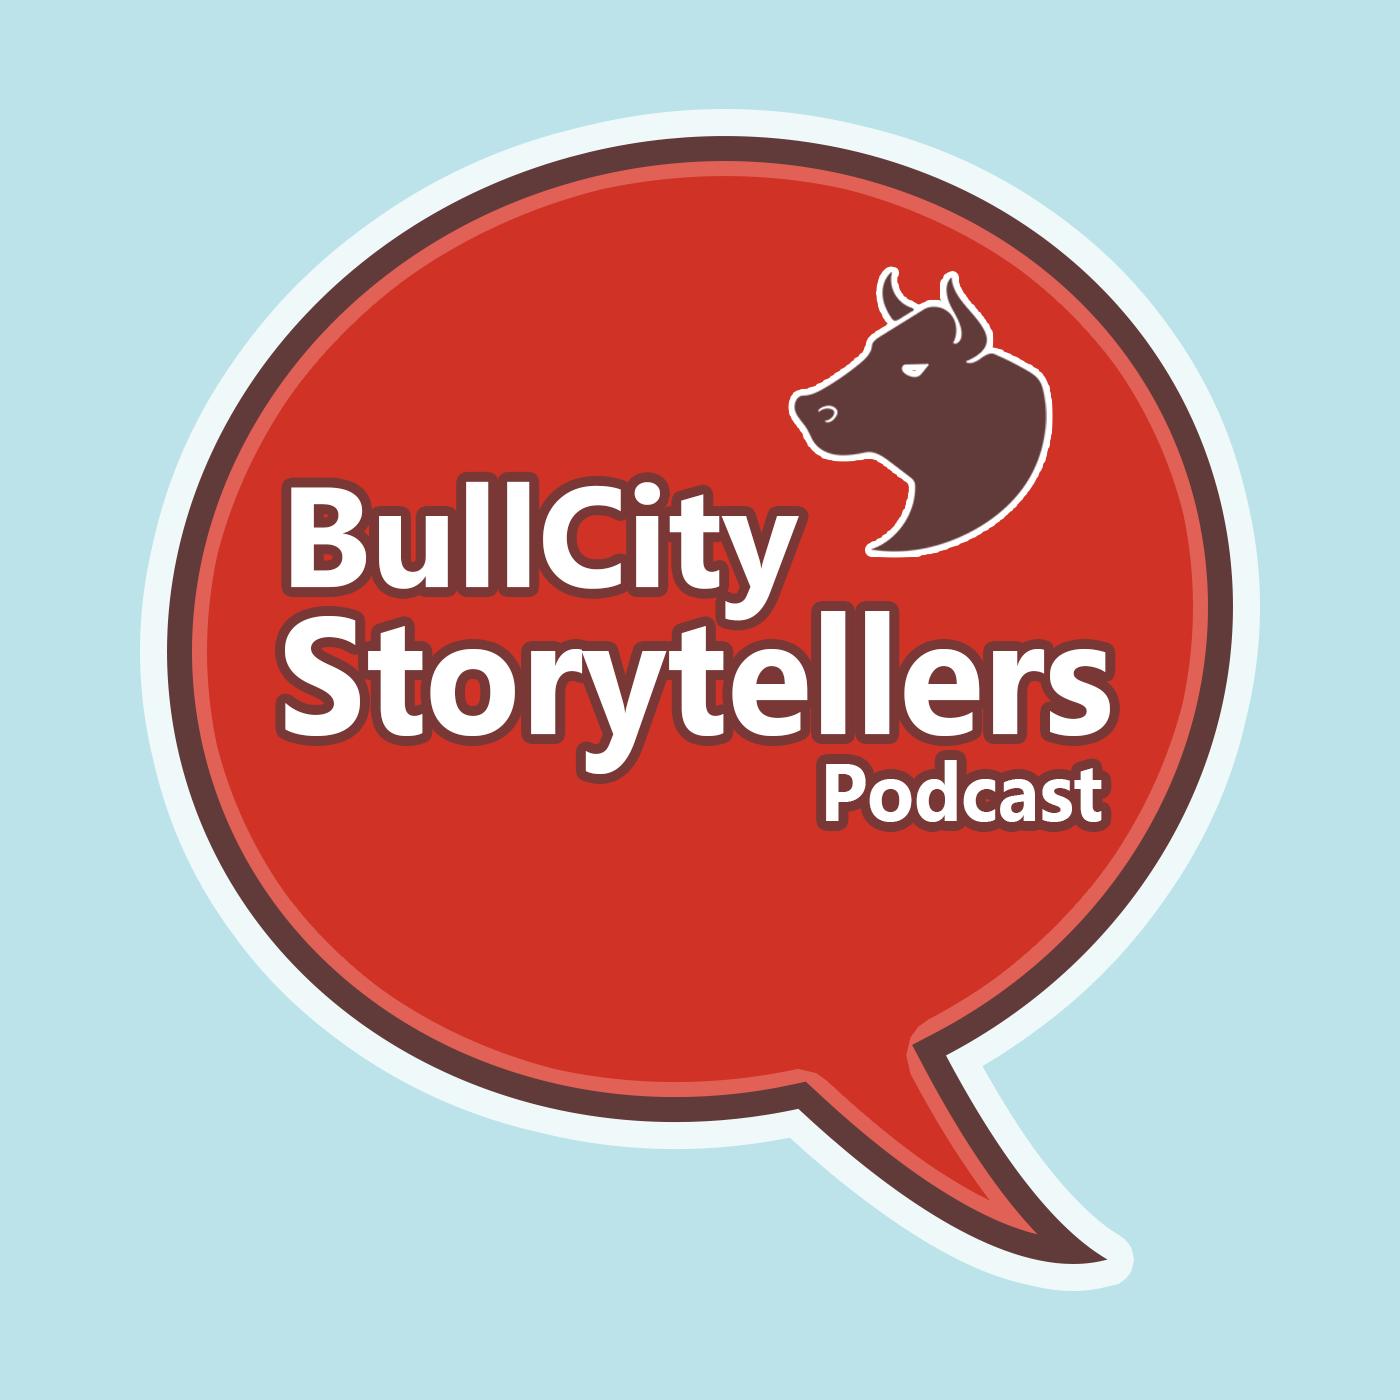 BullCity Storytellers